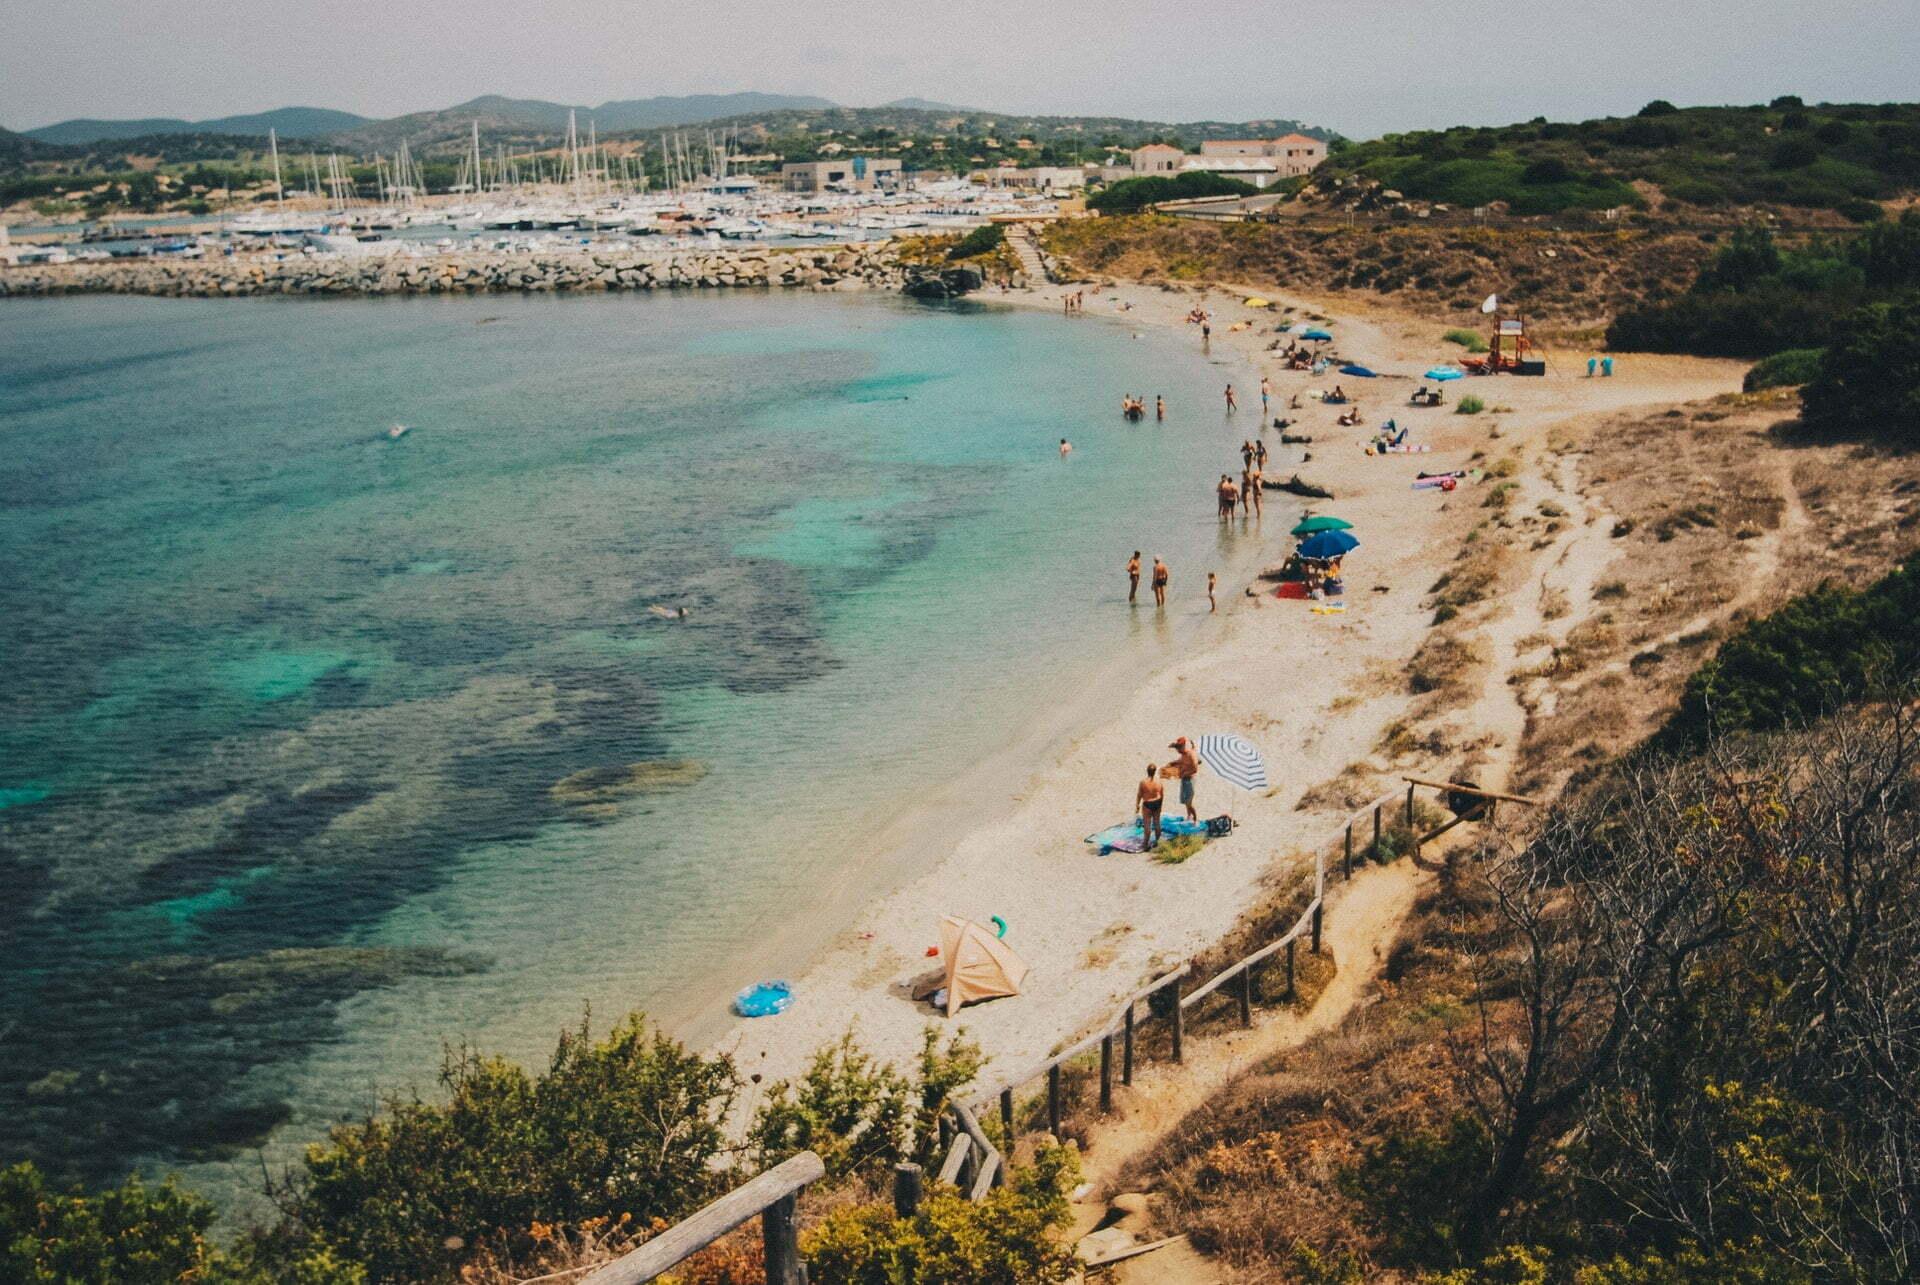 What to See in Cagliari, Sardinia